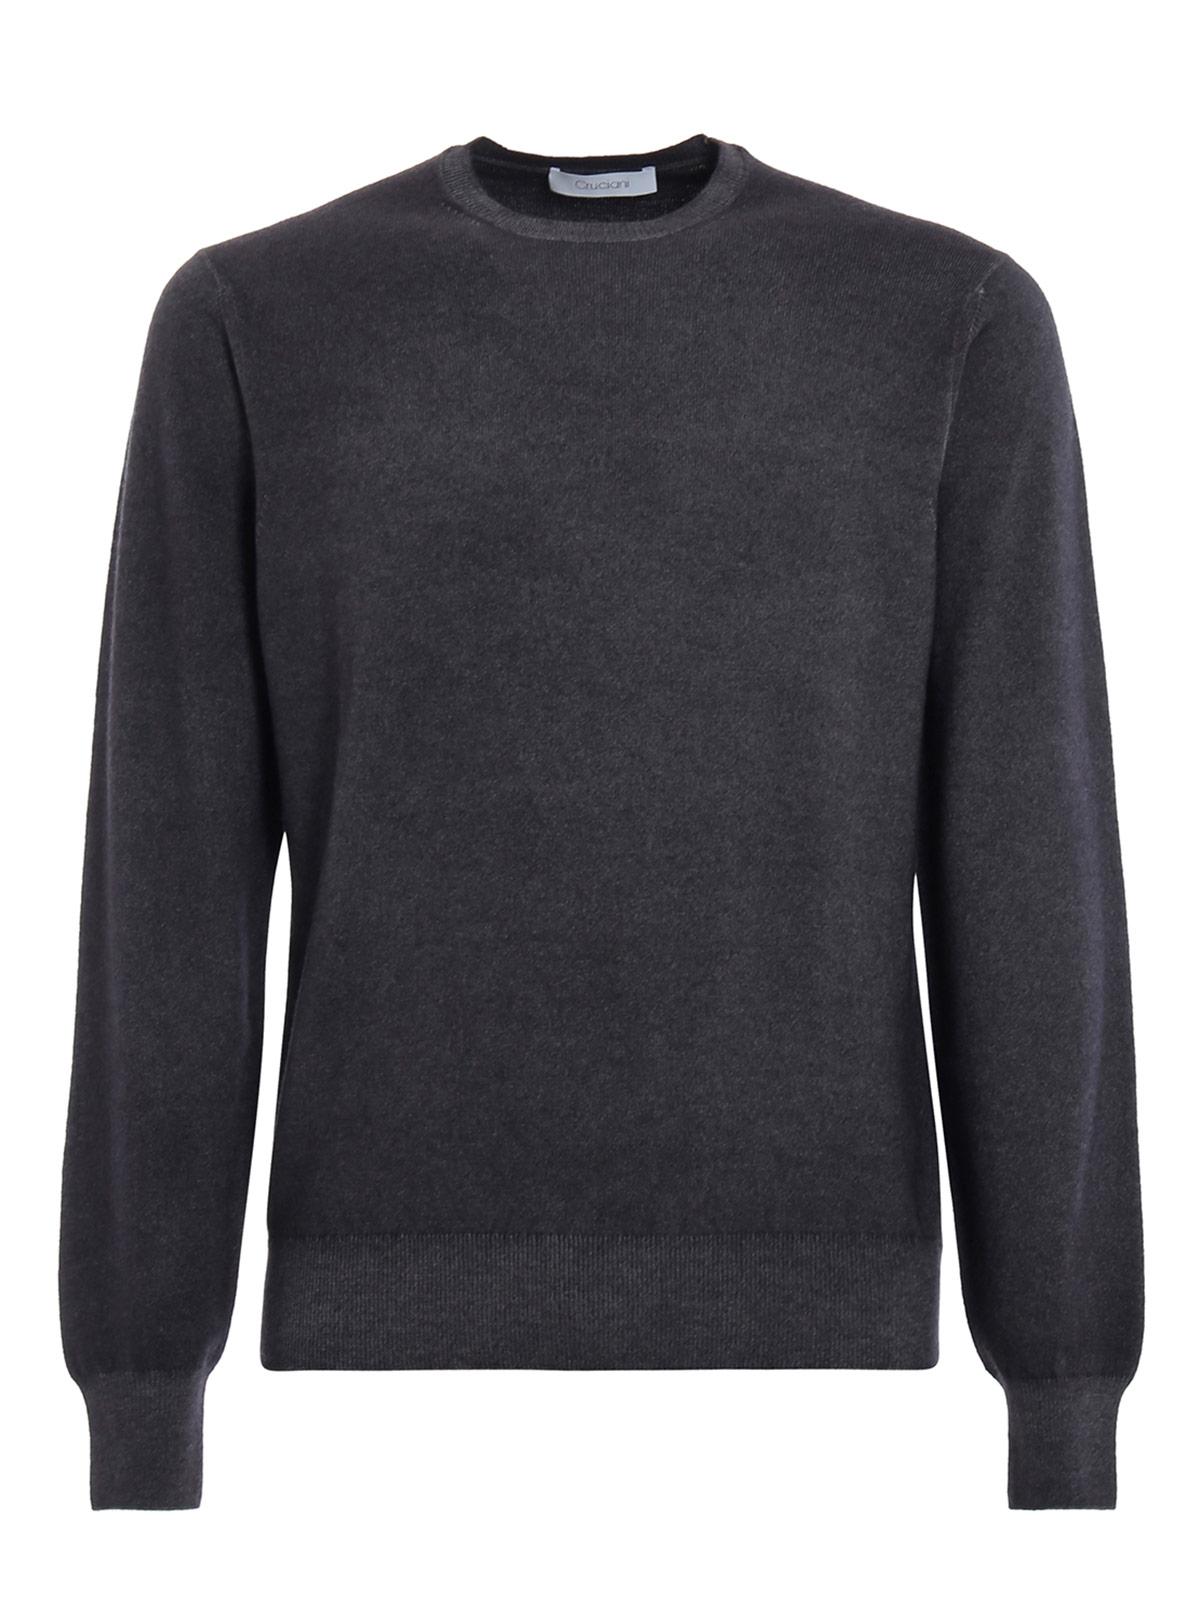 Picture of CRUCIANI | Men's Crewneck Cashmere Sweater